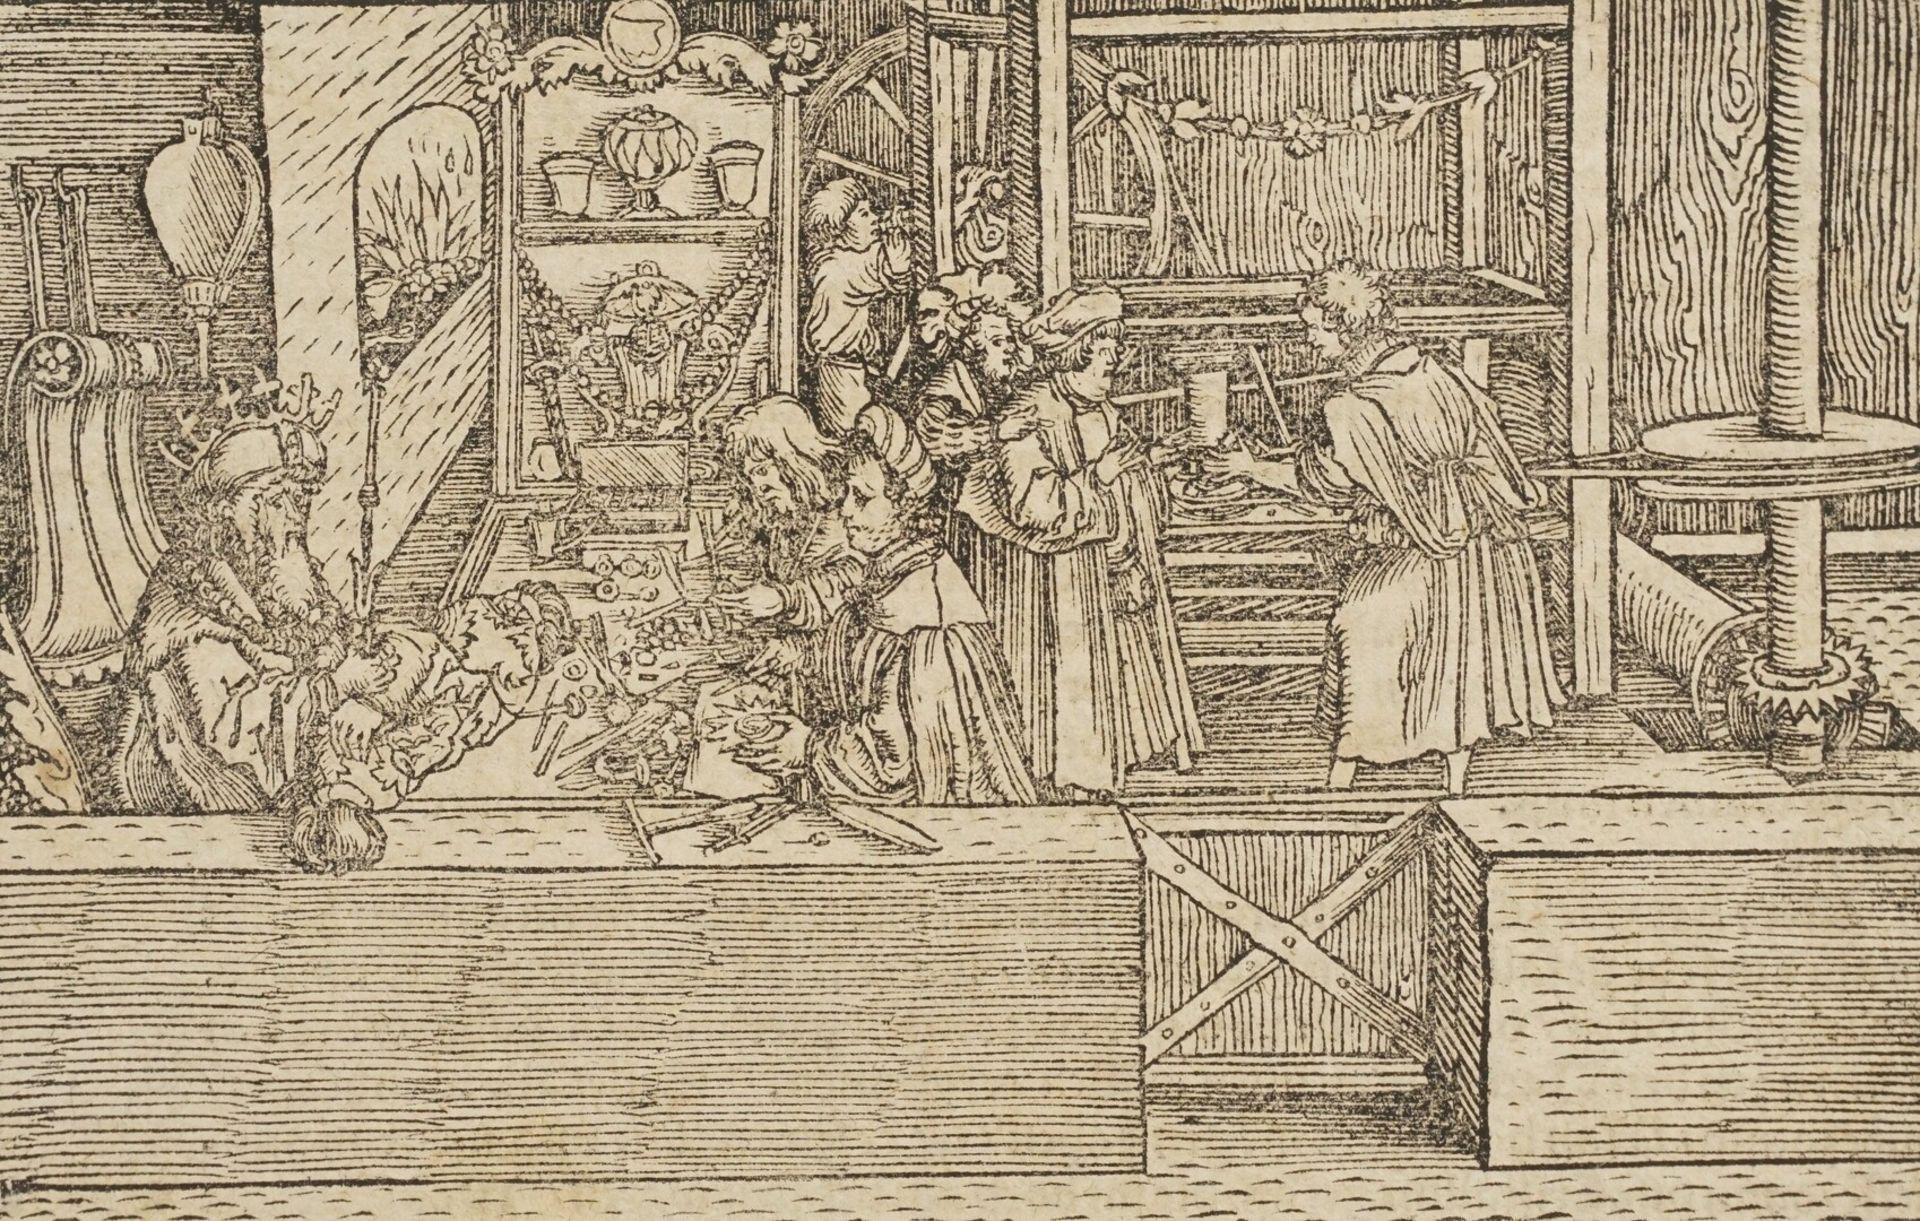 Petrarcameister, Der Gold- und Silberschmied